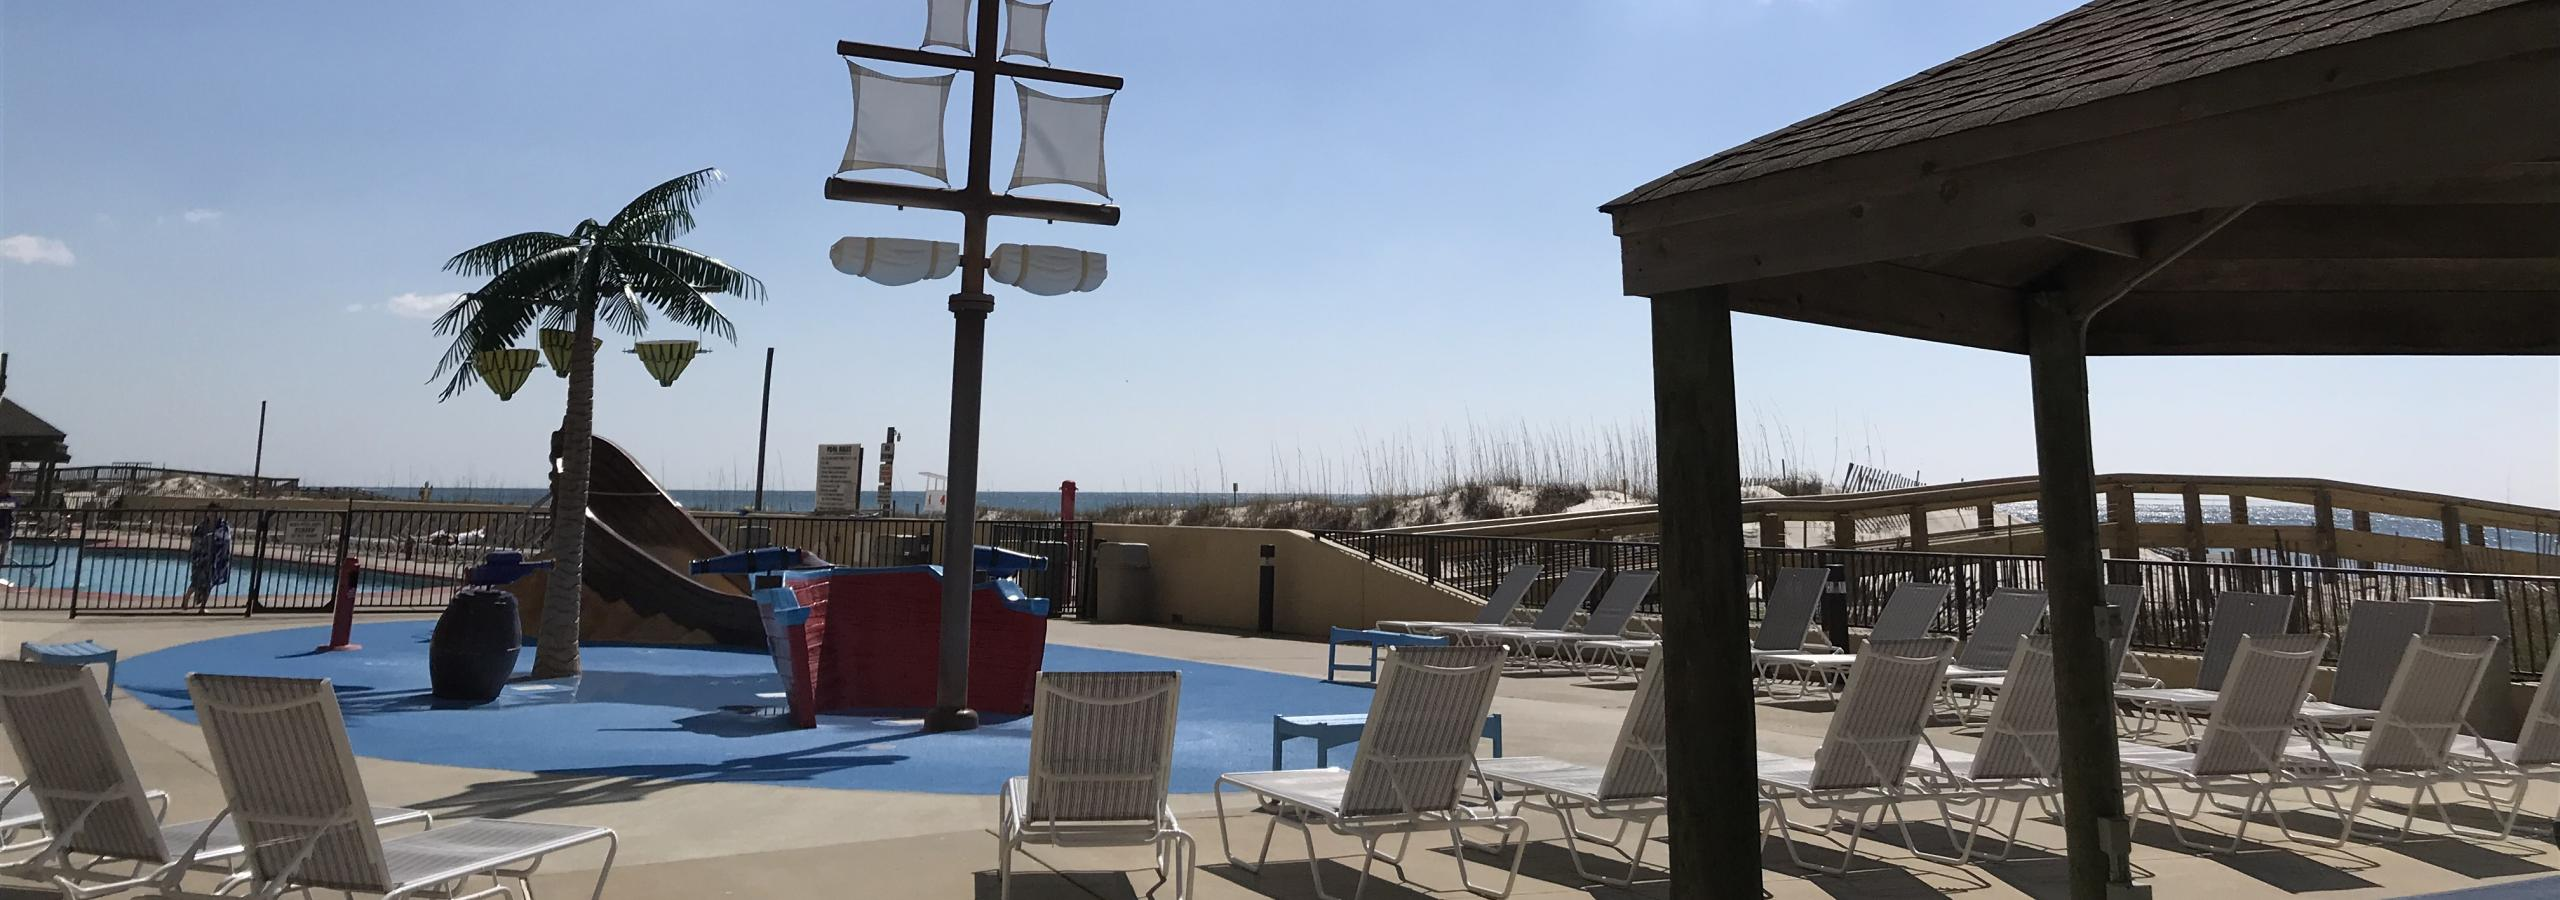 Splash Pad Orange Beach AL Vacation Rentals